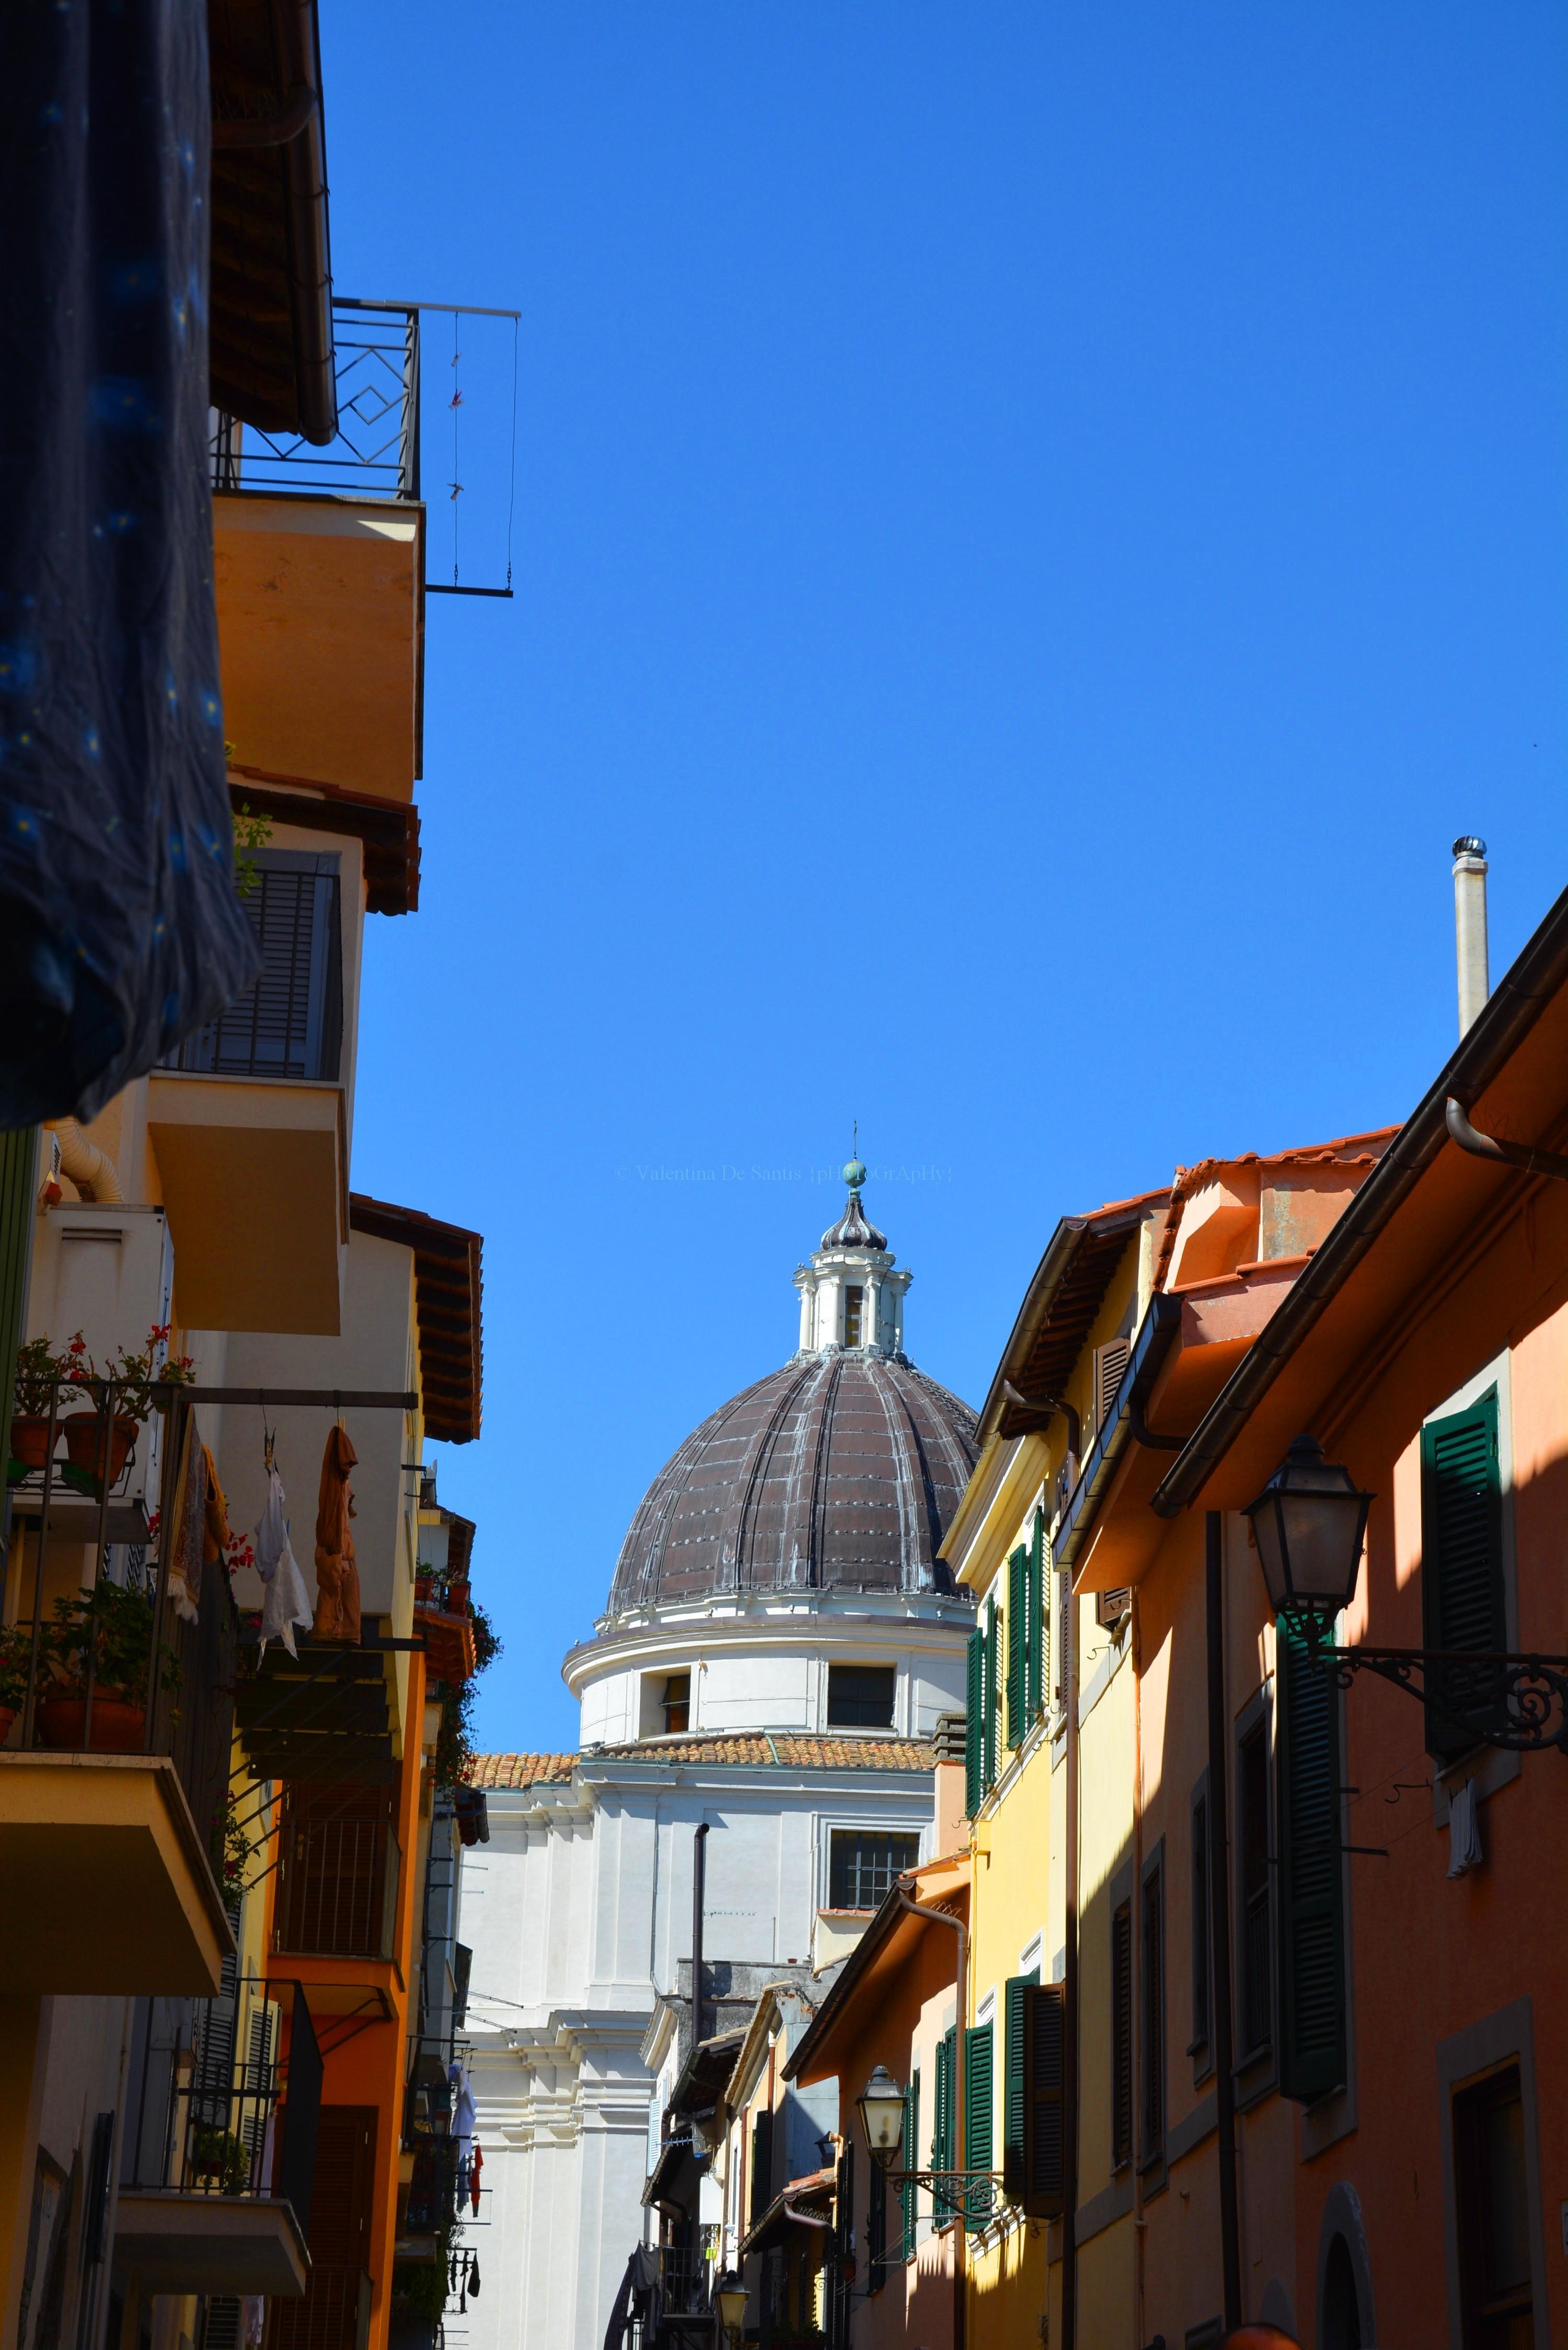 View in the street of Castel Gandolfo